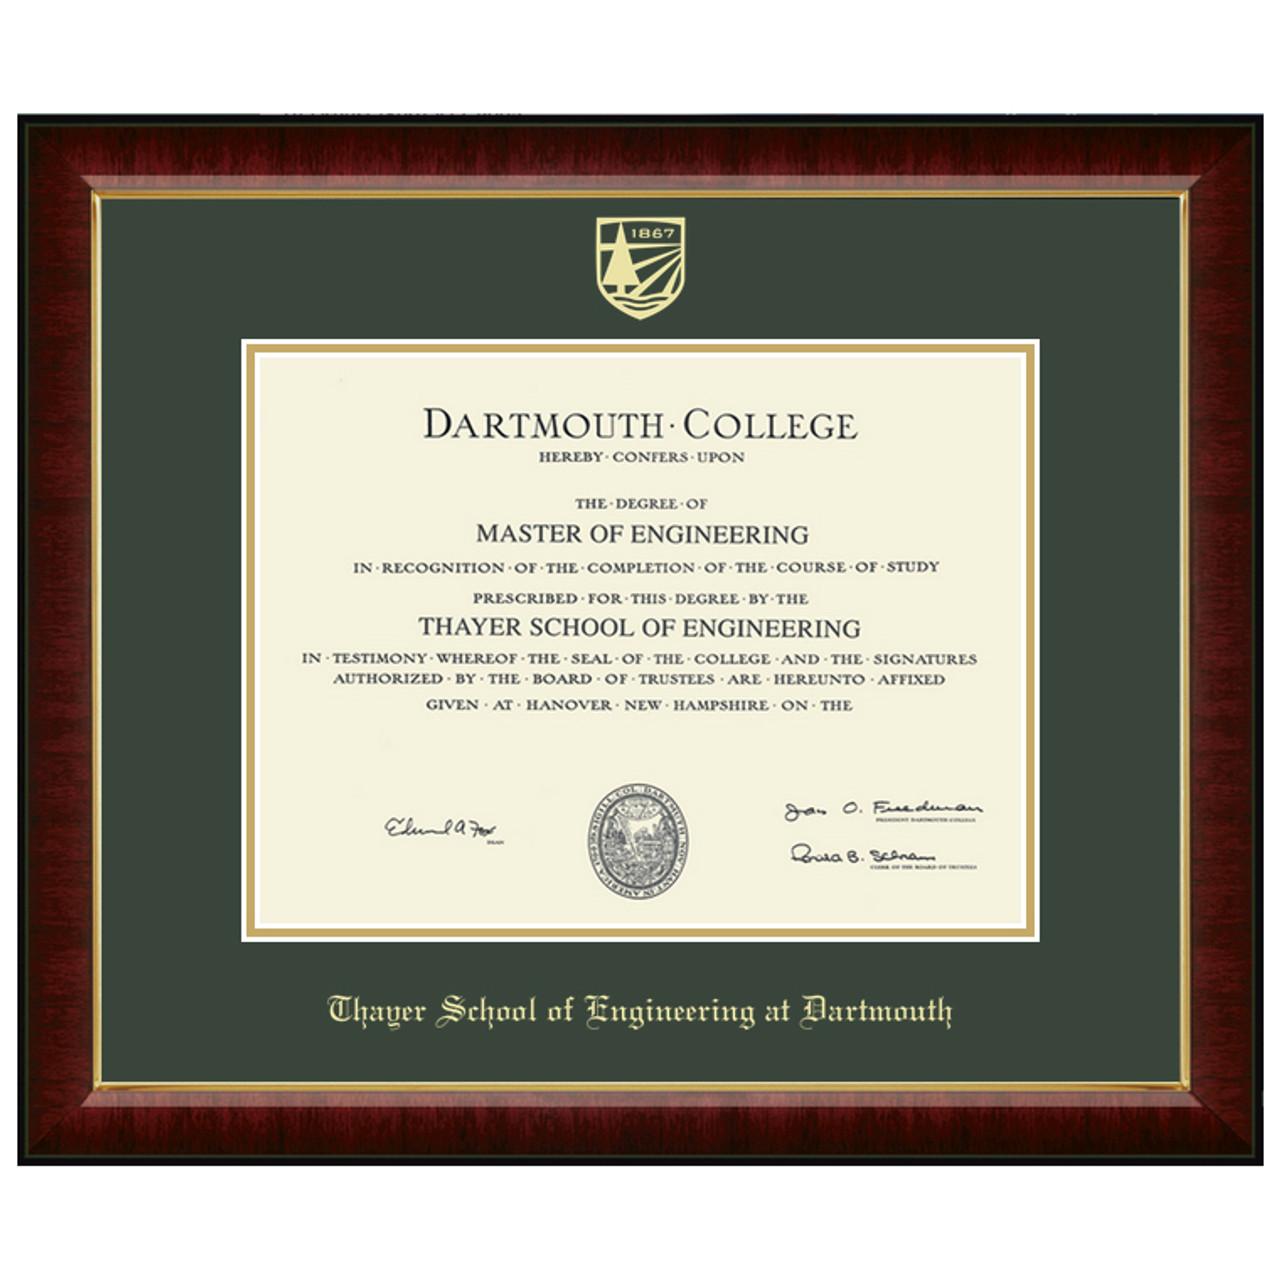 Spirit Shop - Graduation Shop - Diploma Frames and Gifts - Dartmouth ...